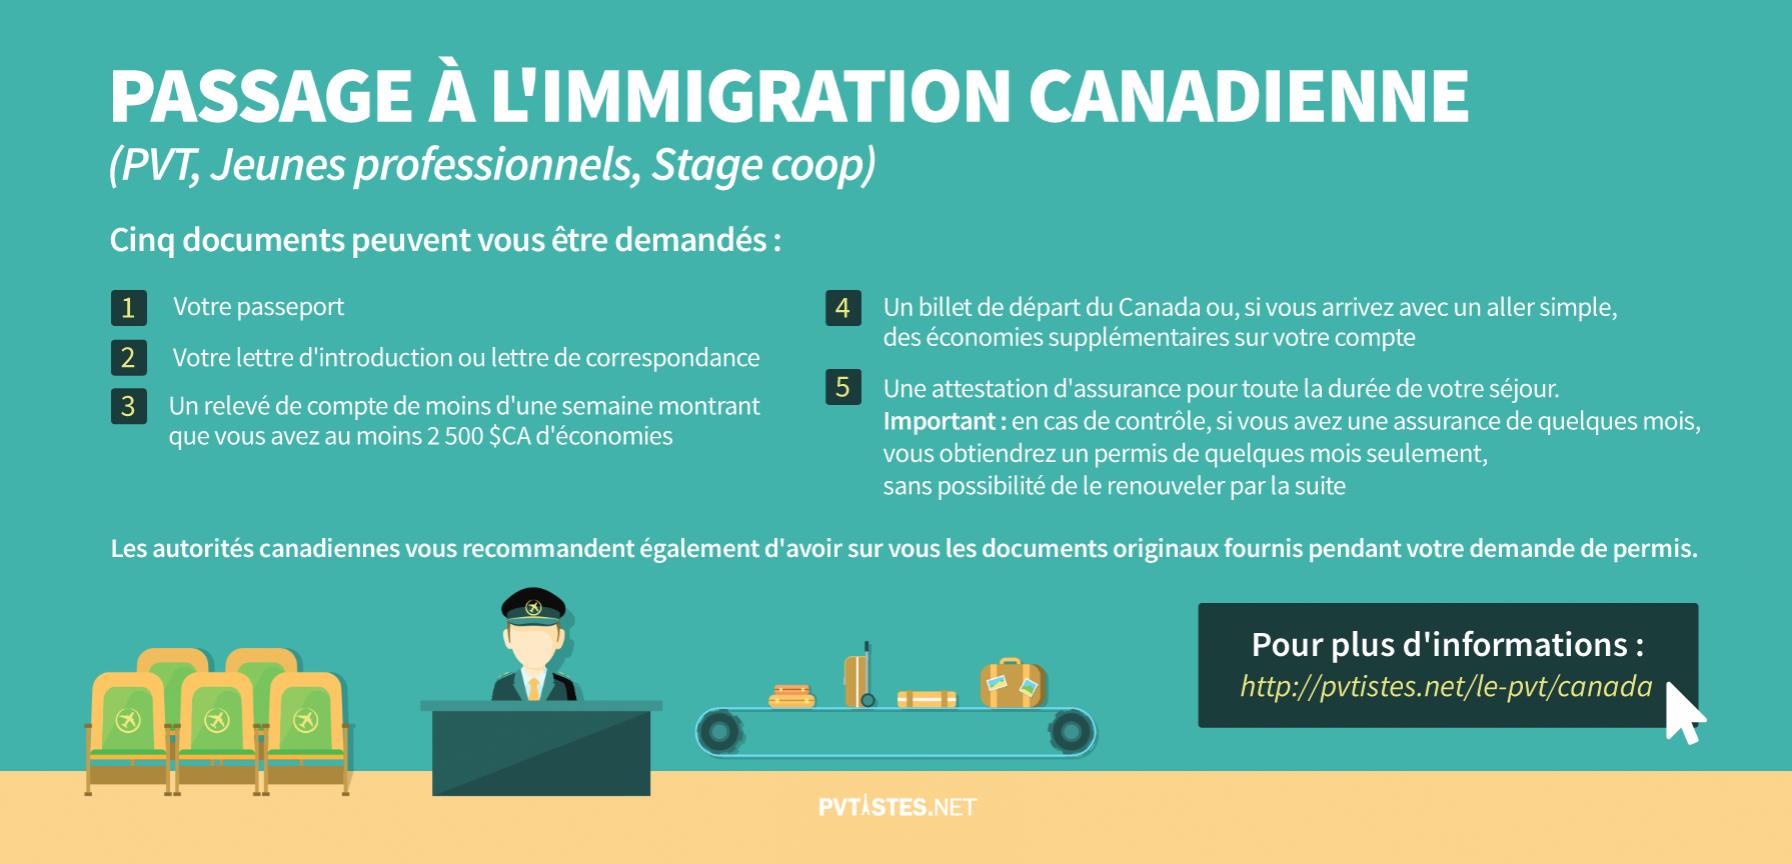 passage-immigration-canada-pdt